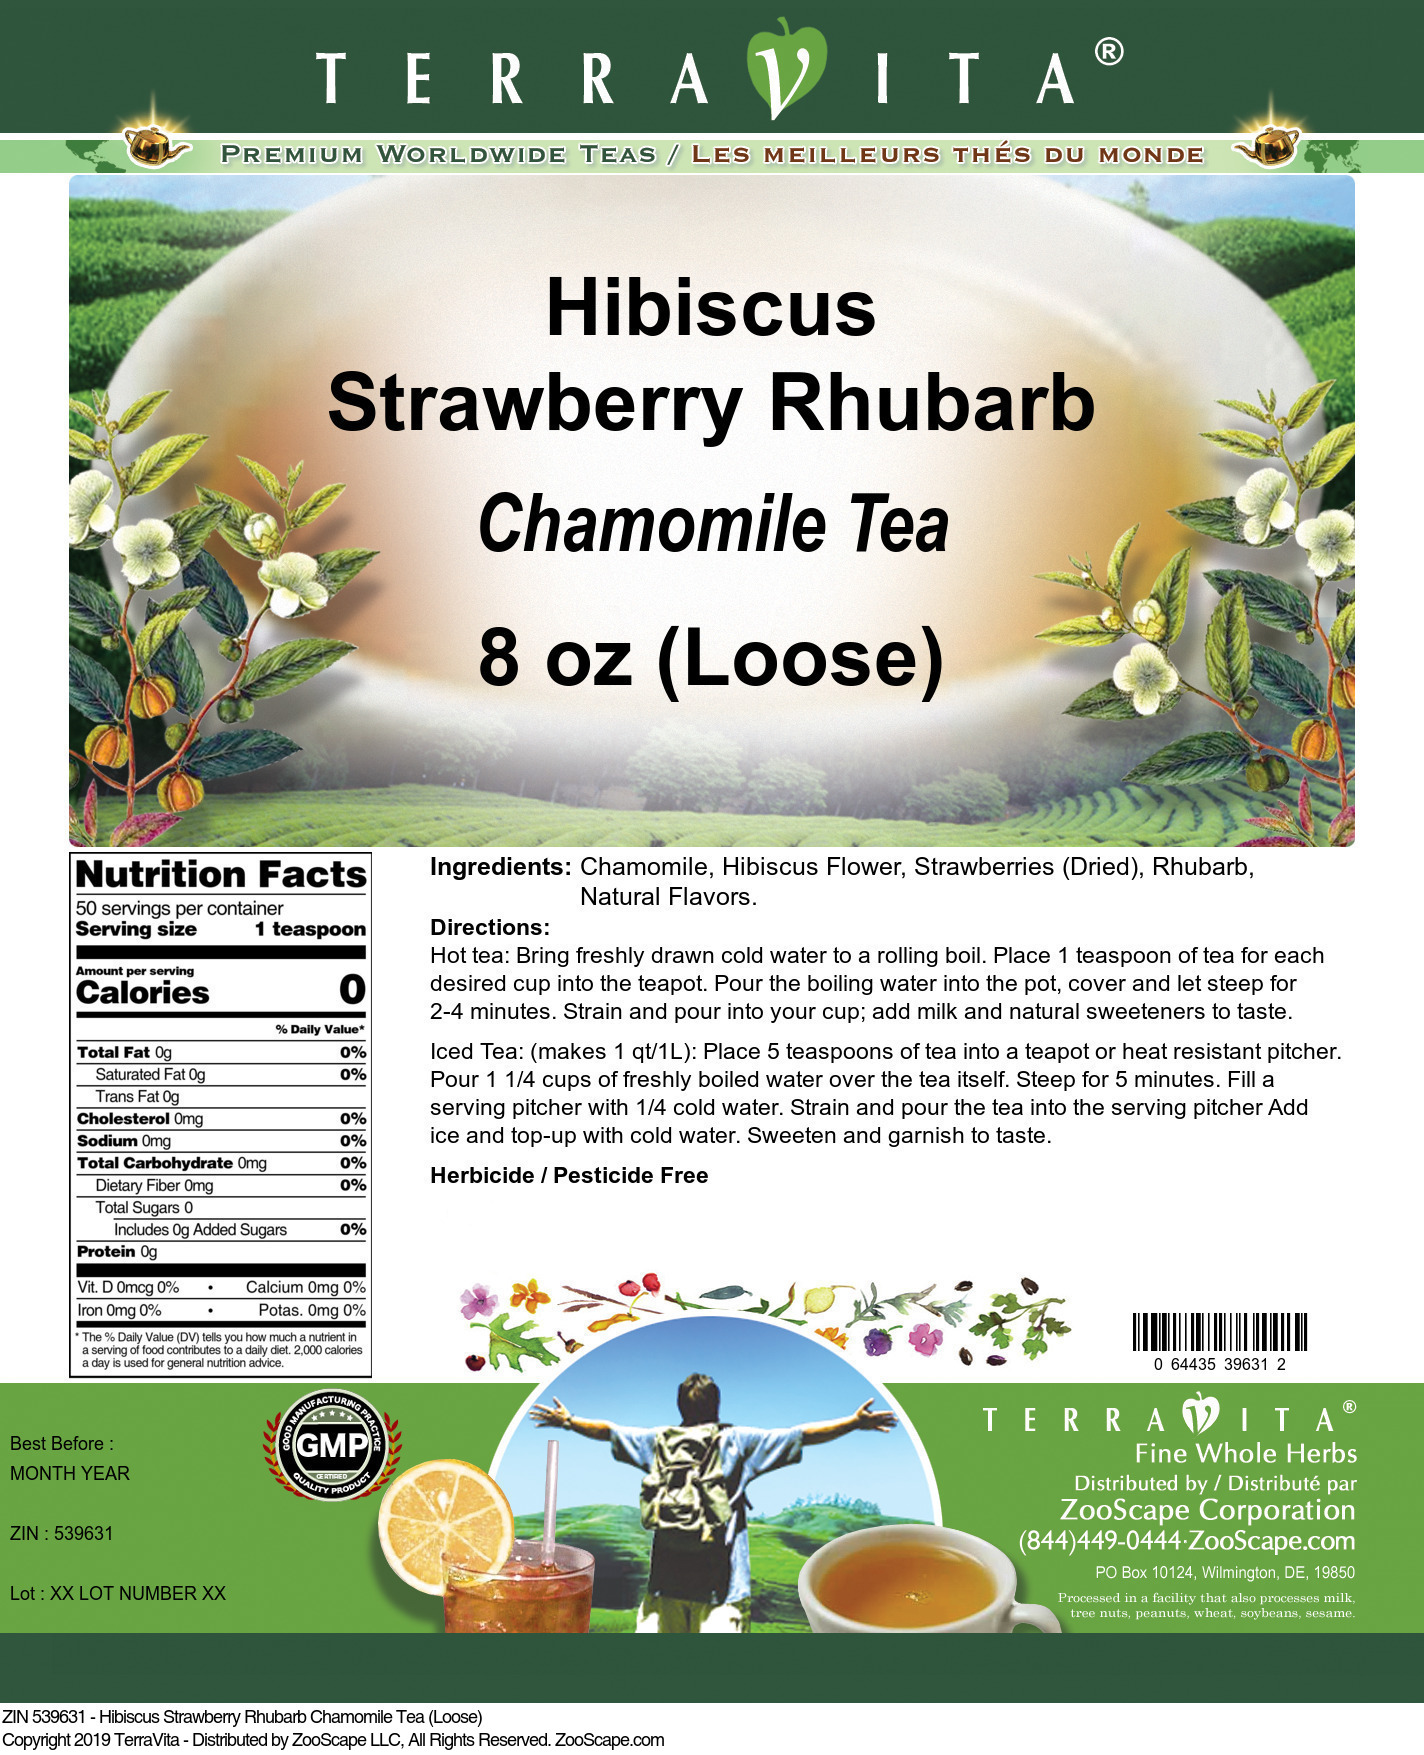 Hibiscus Strawberry Rhubarb Chamomile Tea (Loose)